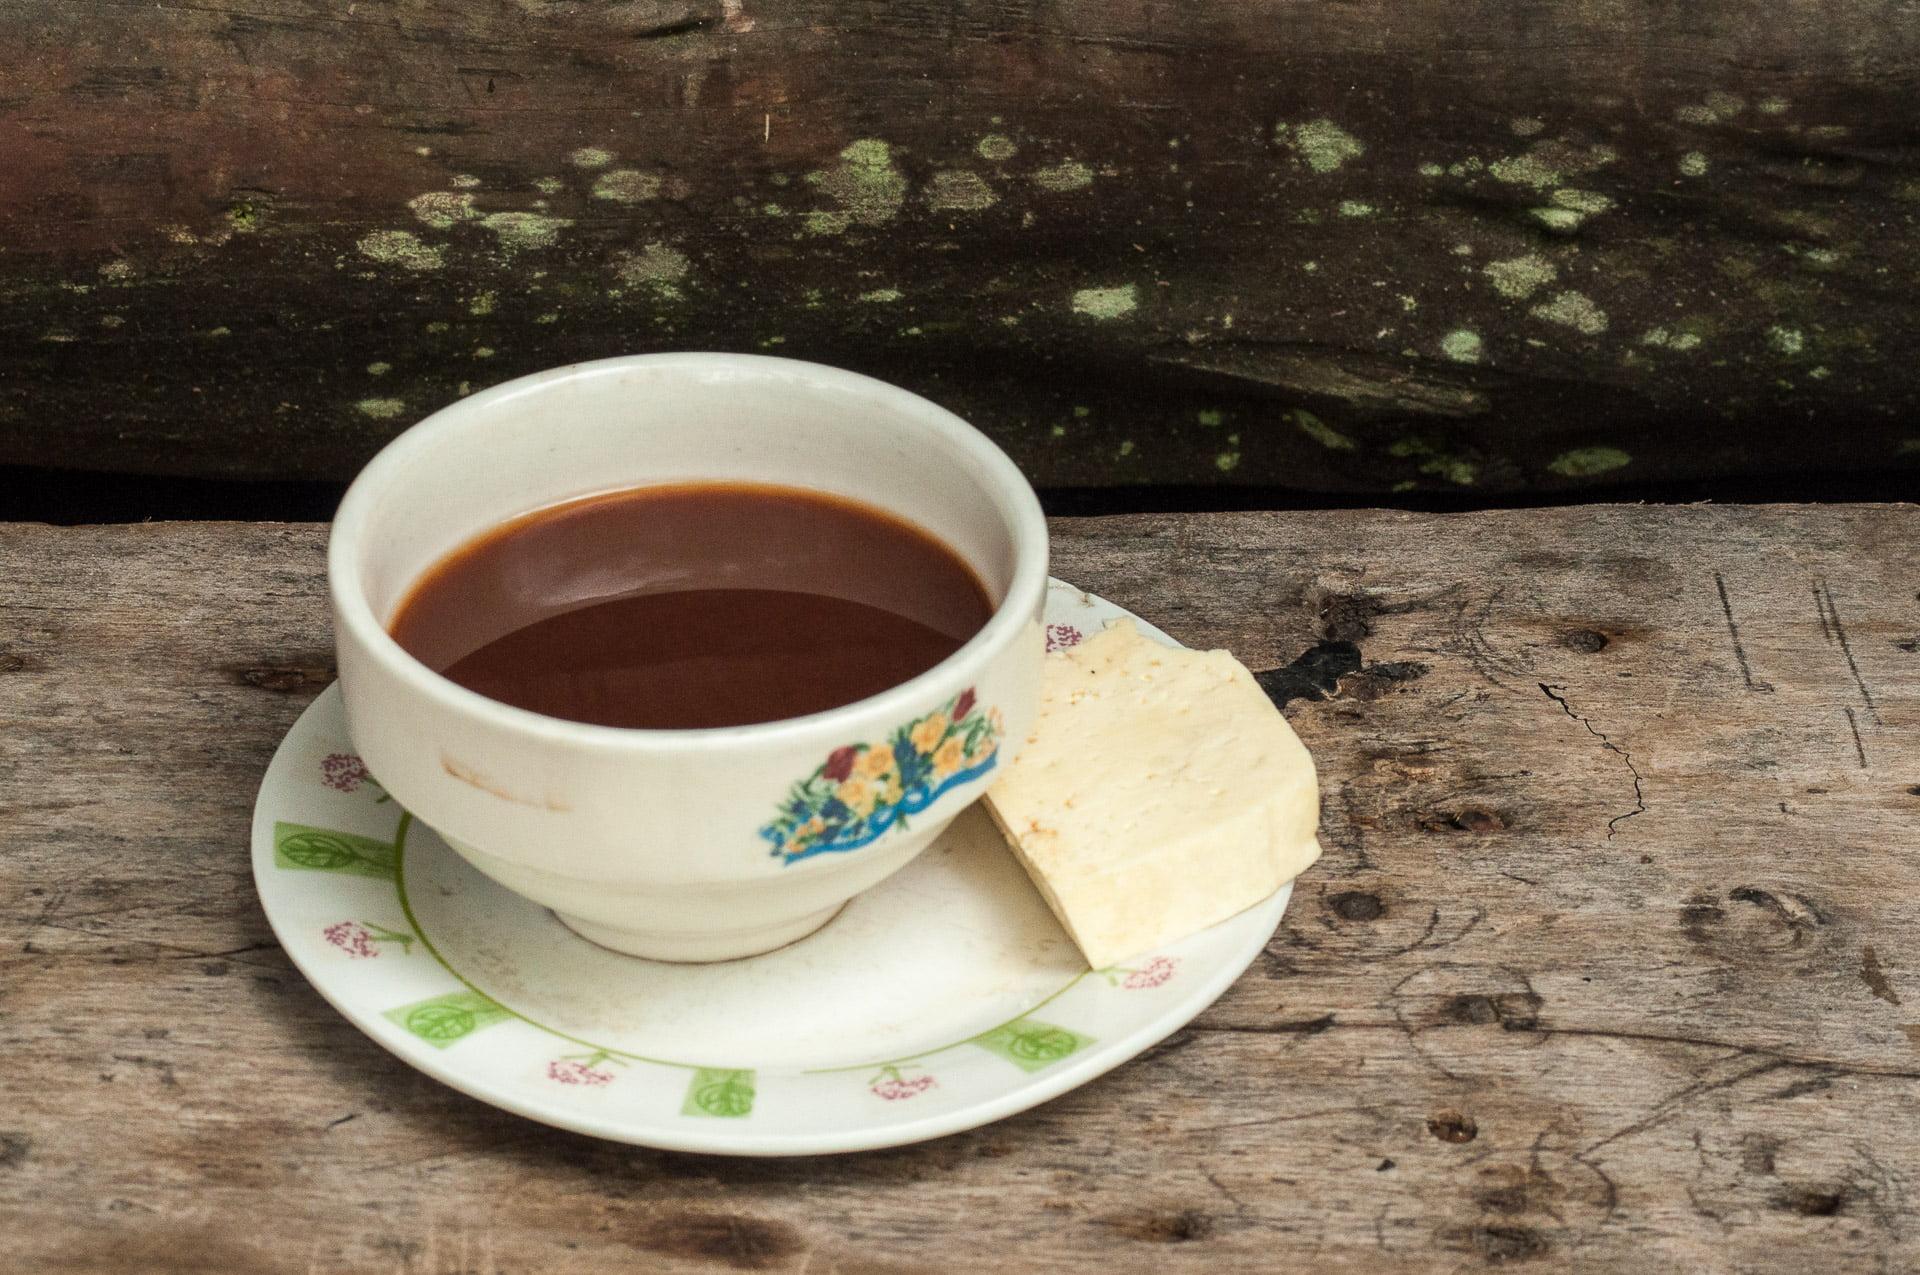 cocora chocolat - Les globe blogueurs - blog voyage nature